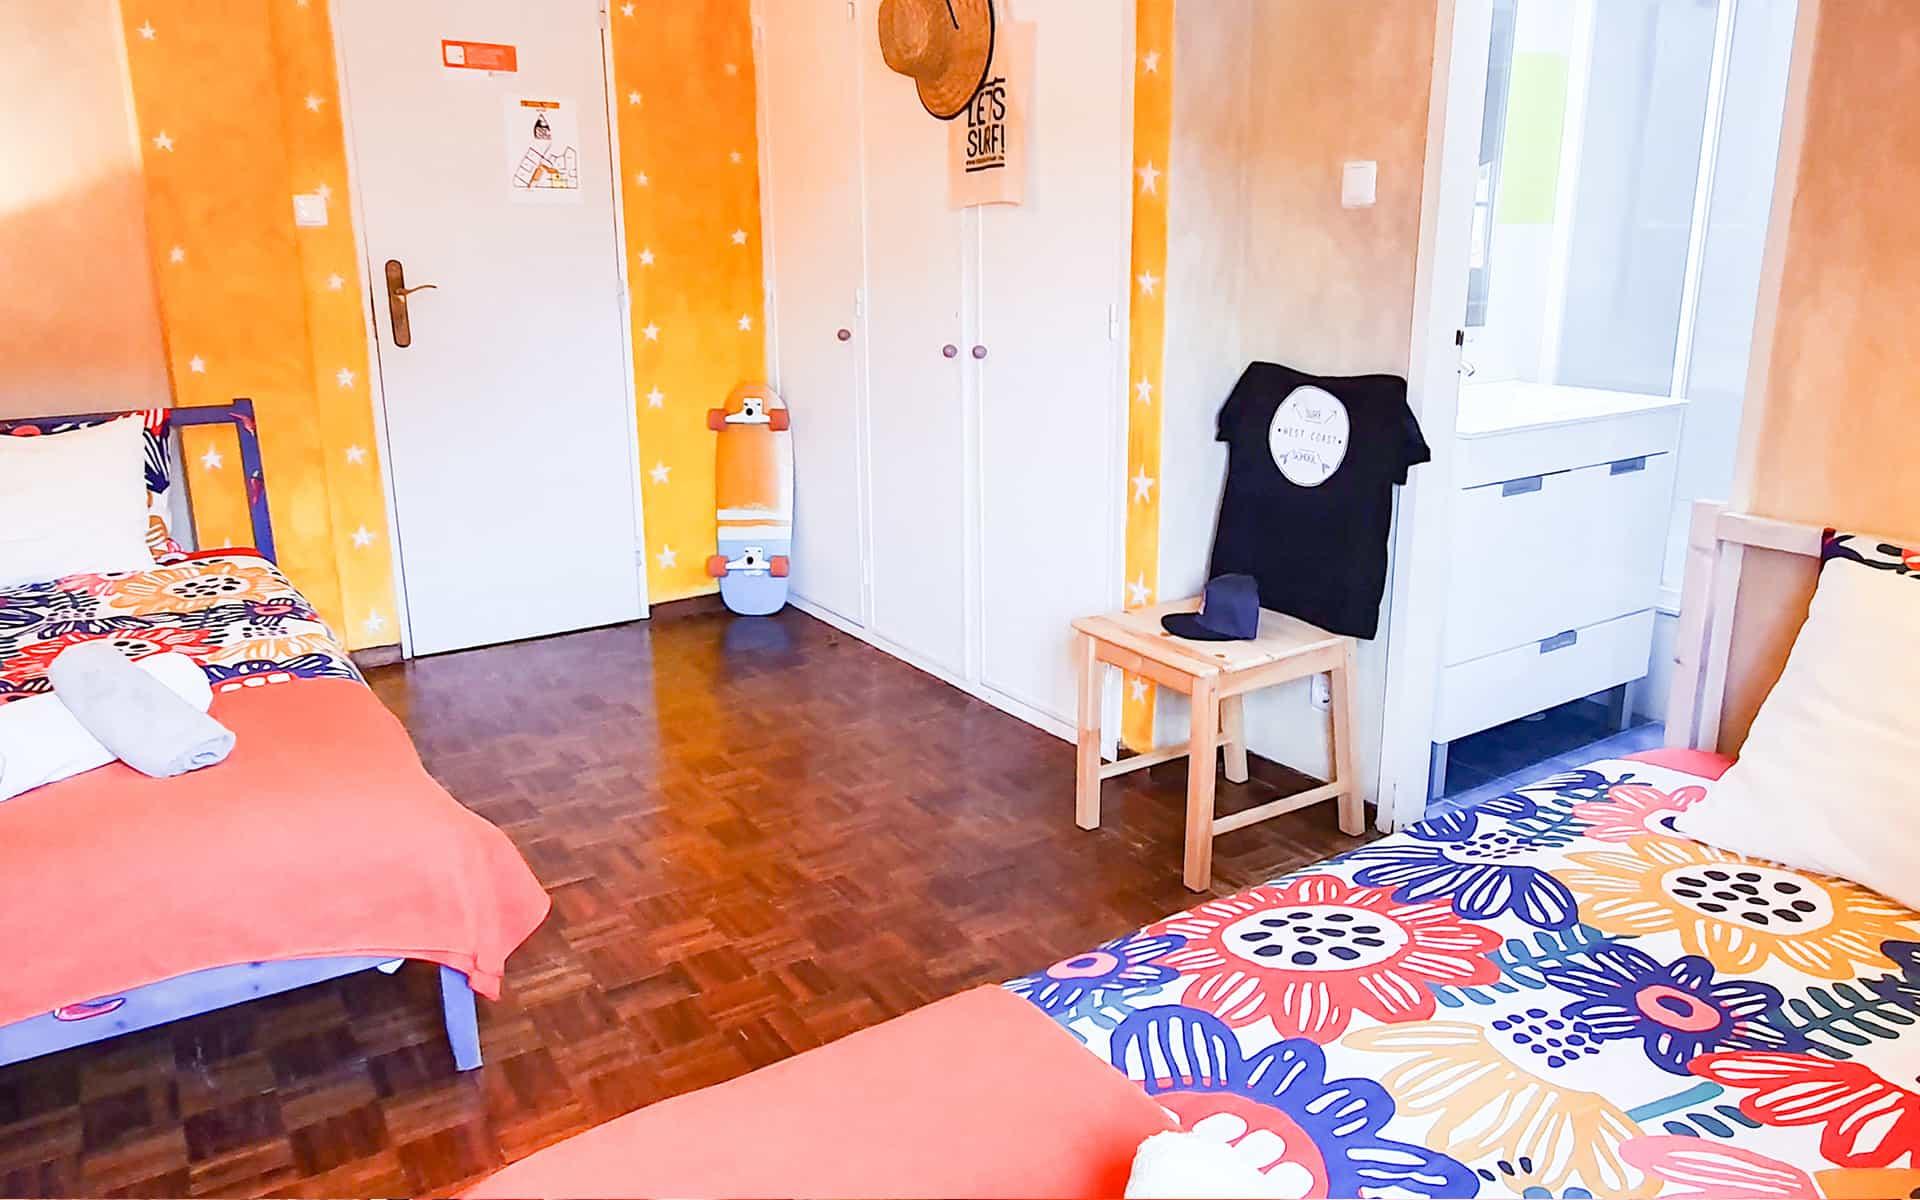 surf camp ericeira - Booking Rooms - Orange Room